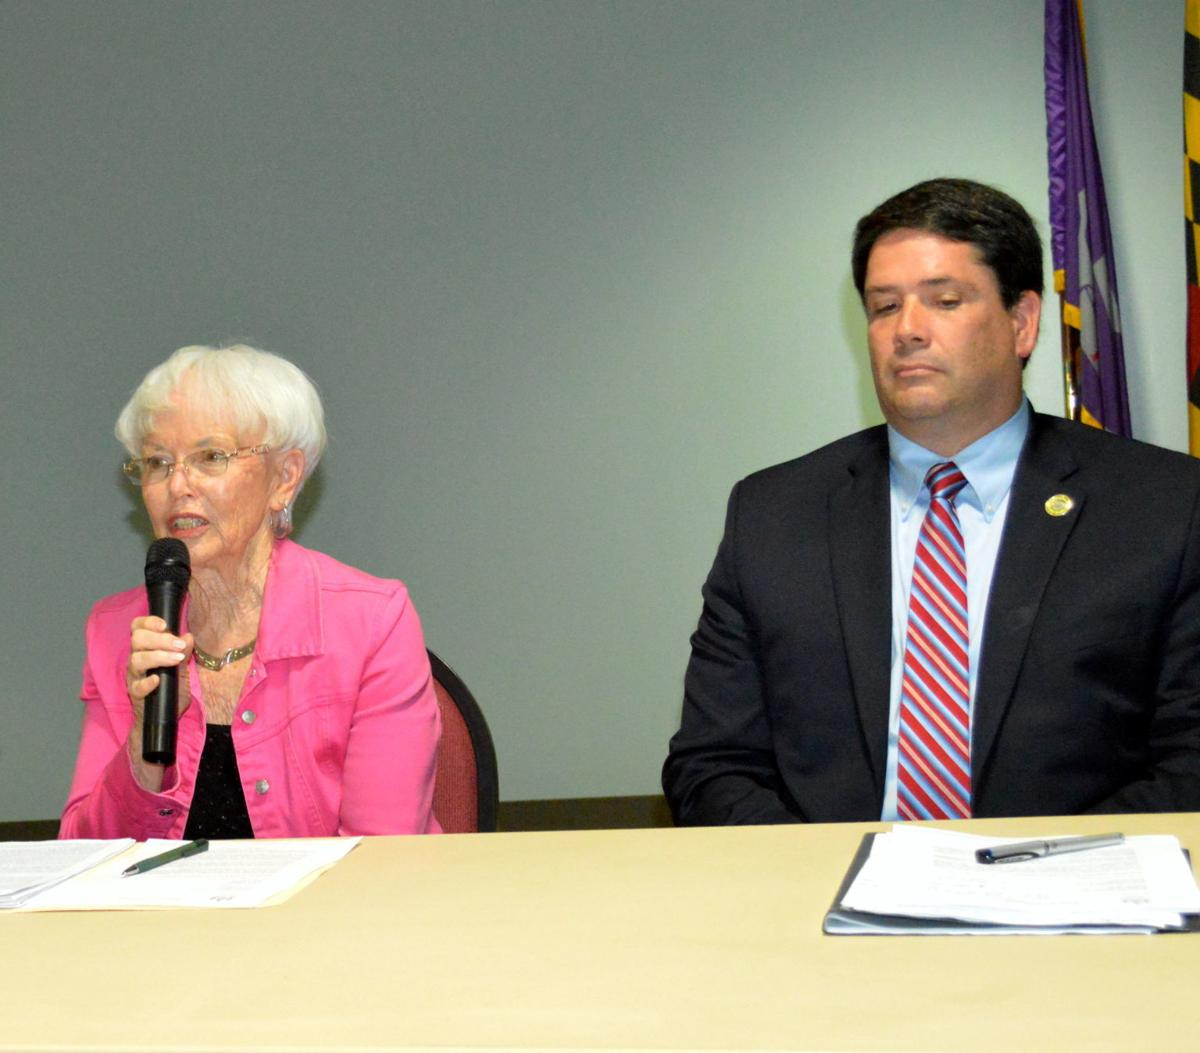 Eckardt, Adams recap General Assembly